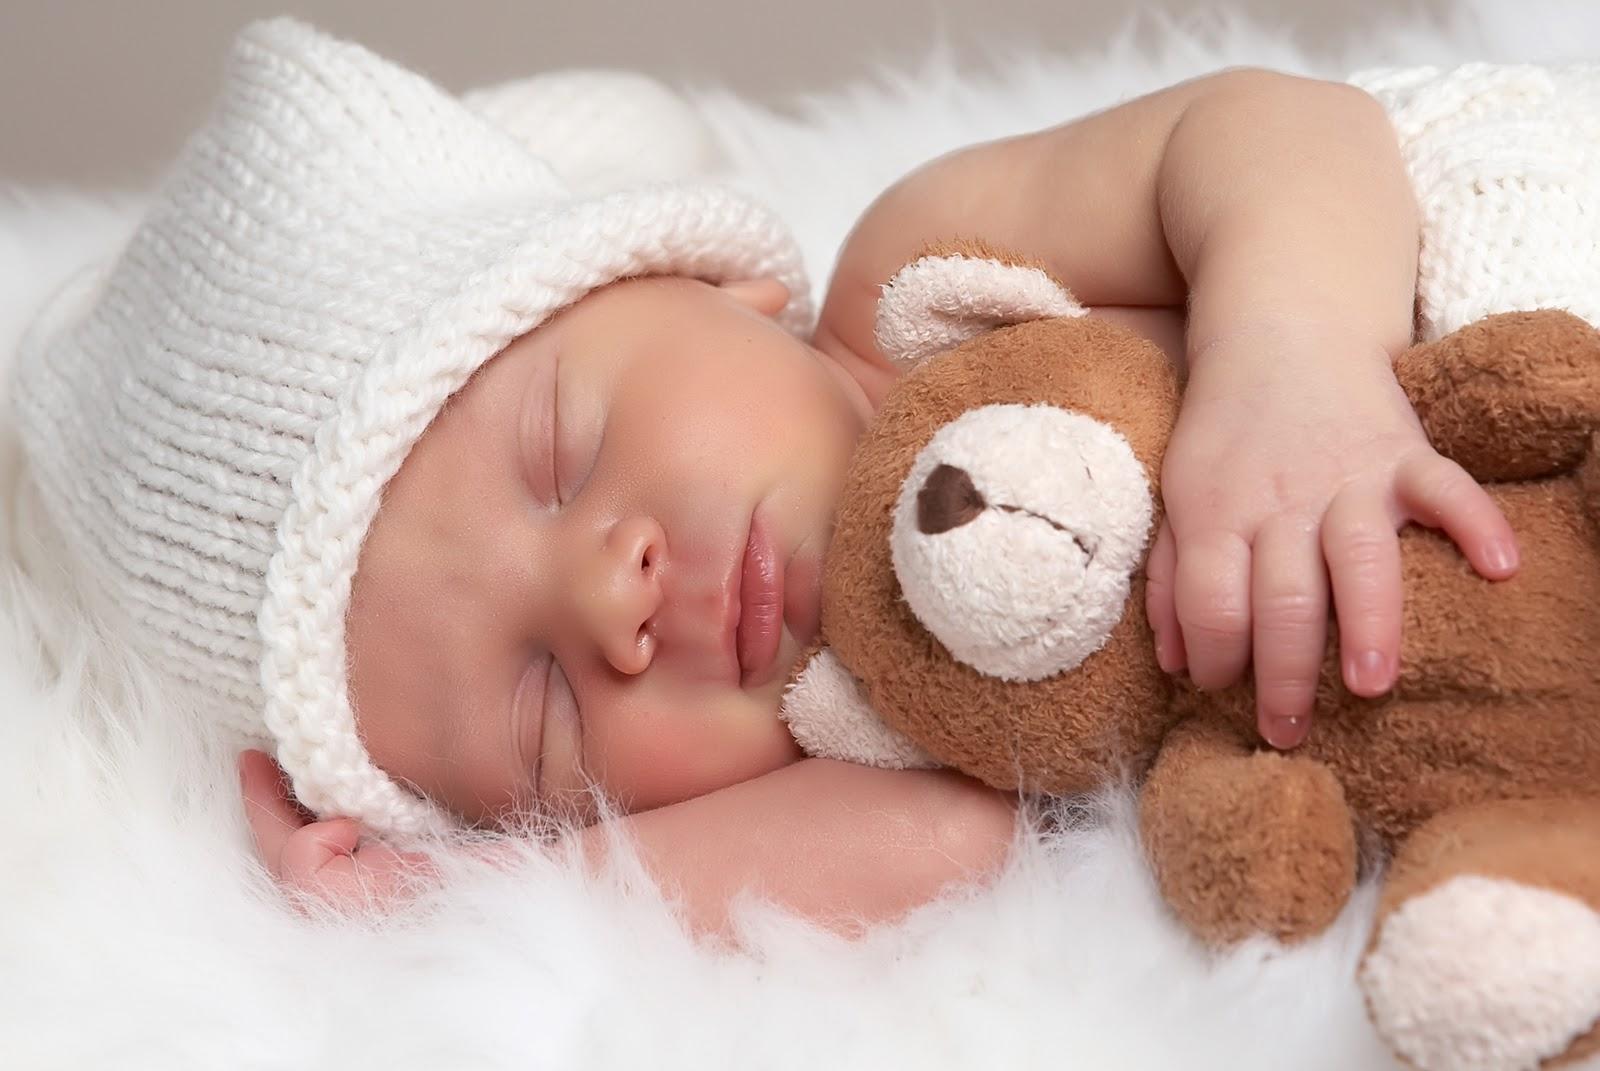 lactancia materna